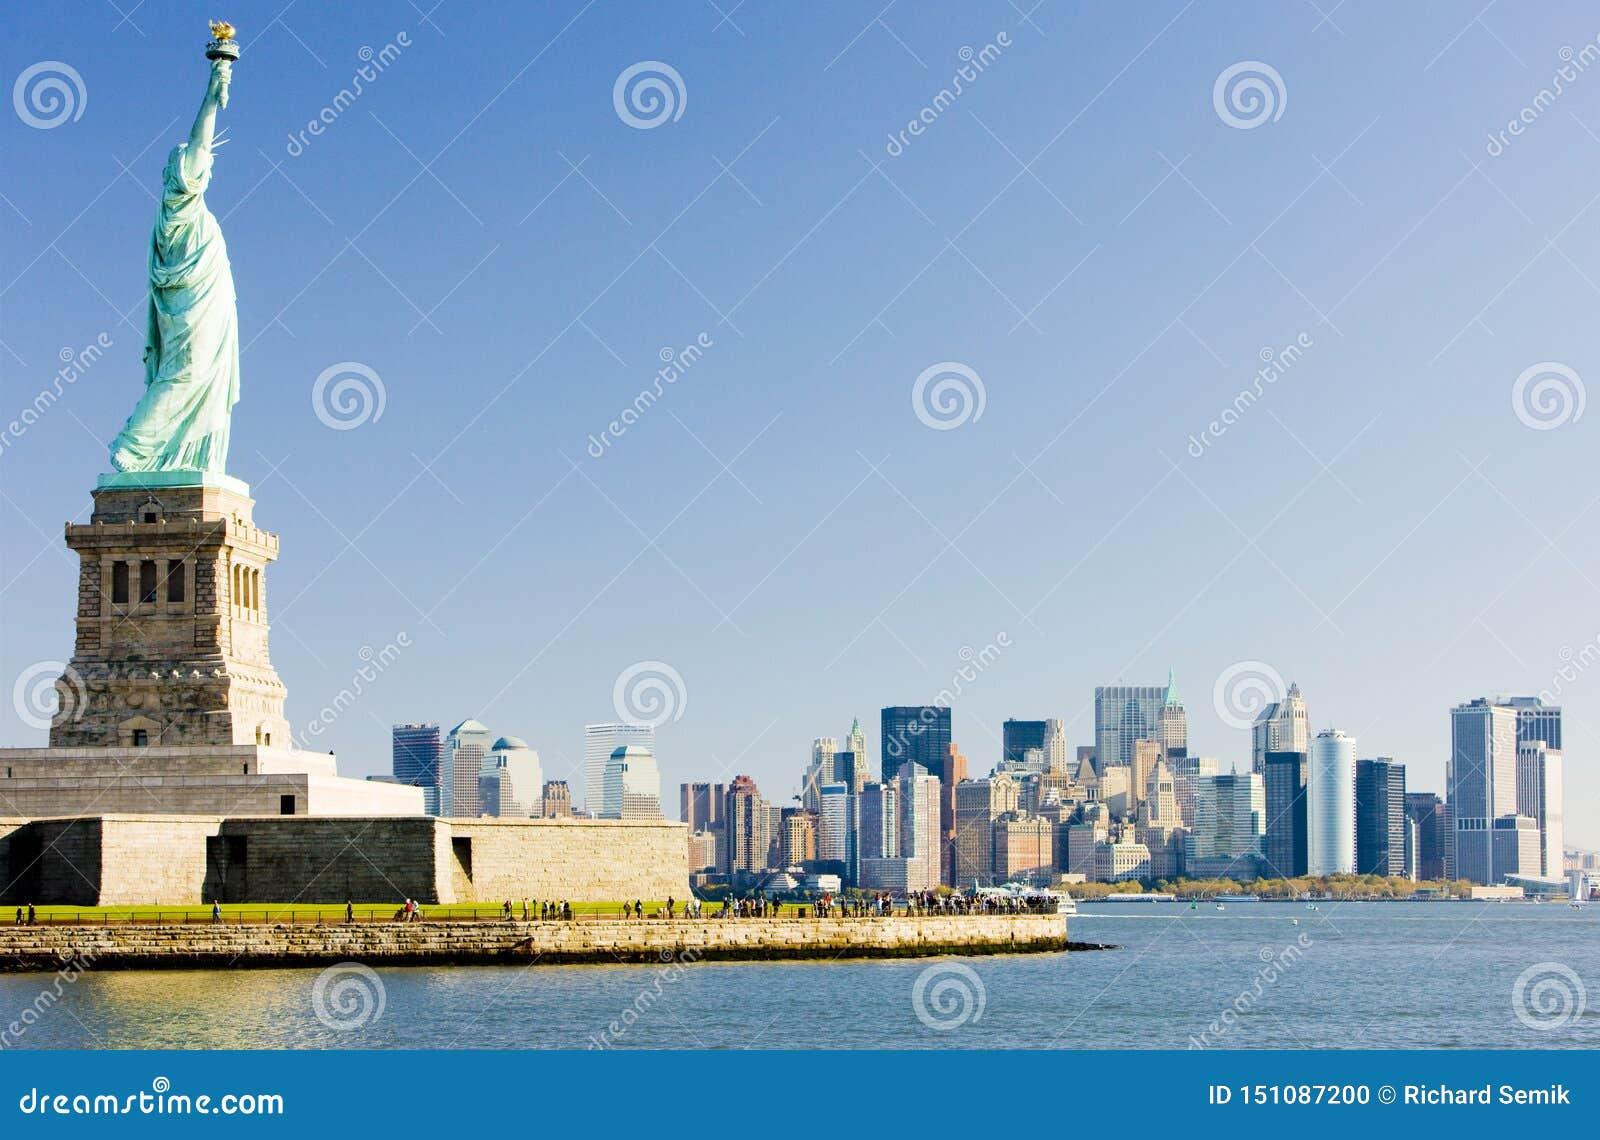 Statue of Liberty and Manhattan, New York City, USA